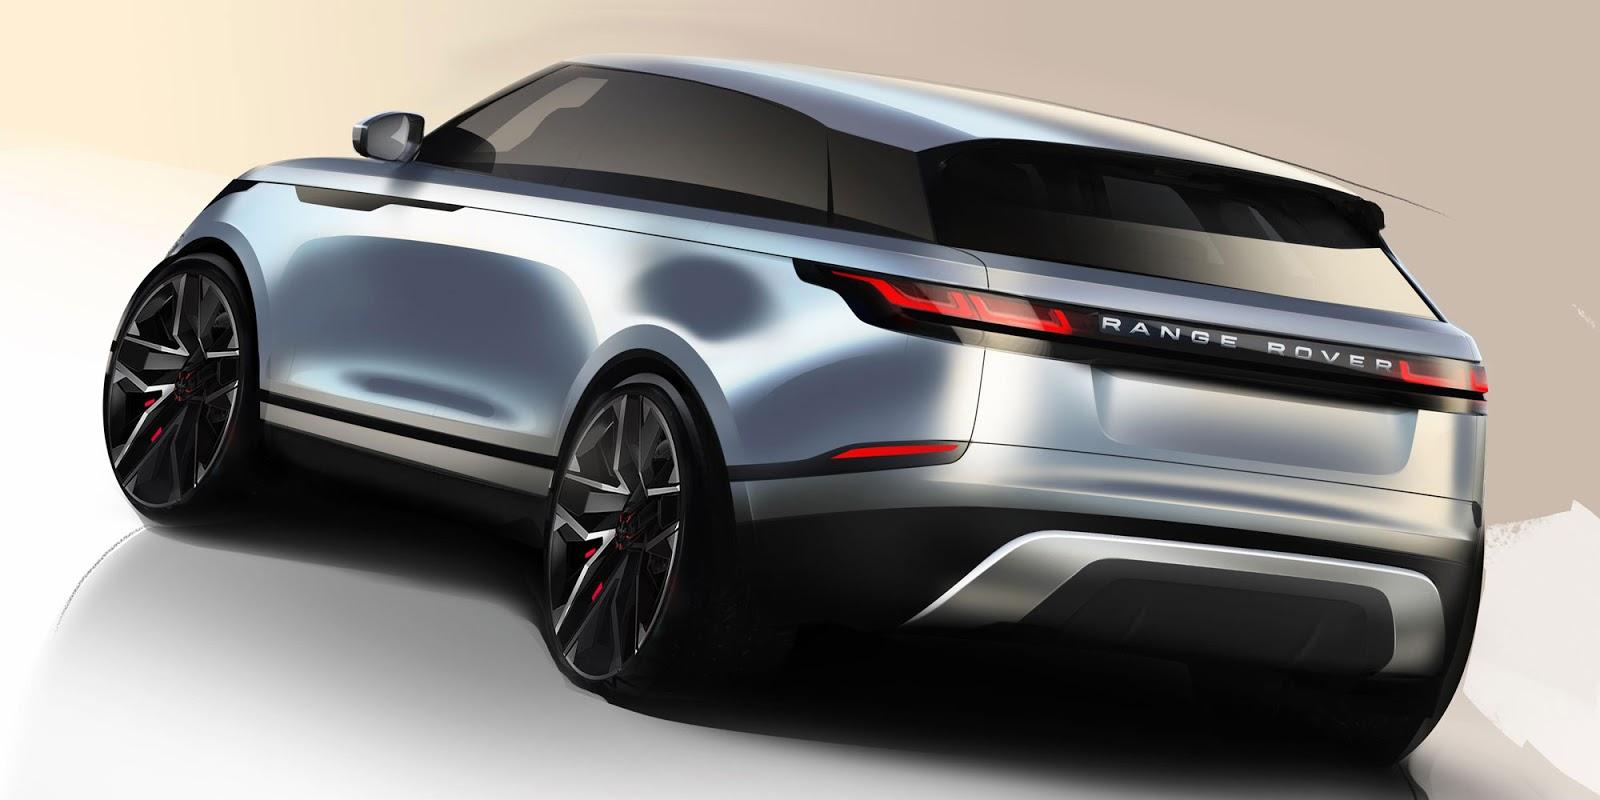 Range Rover Velar sketch rear quarter view in blue